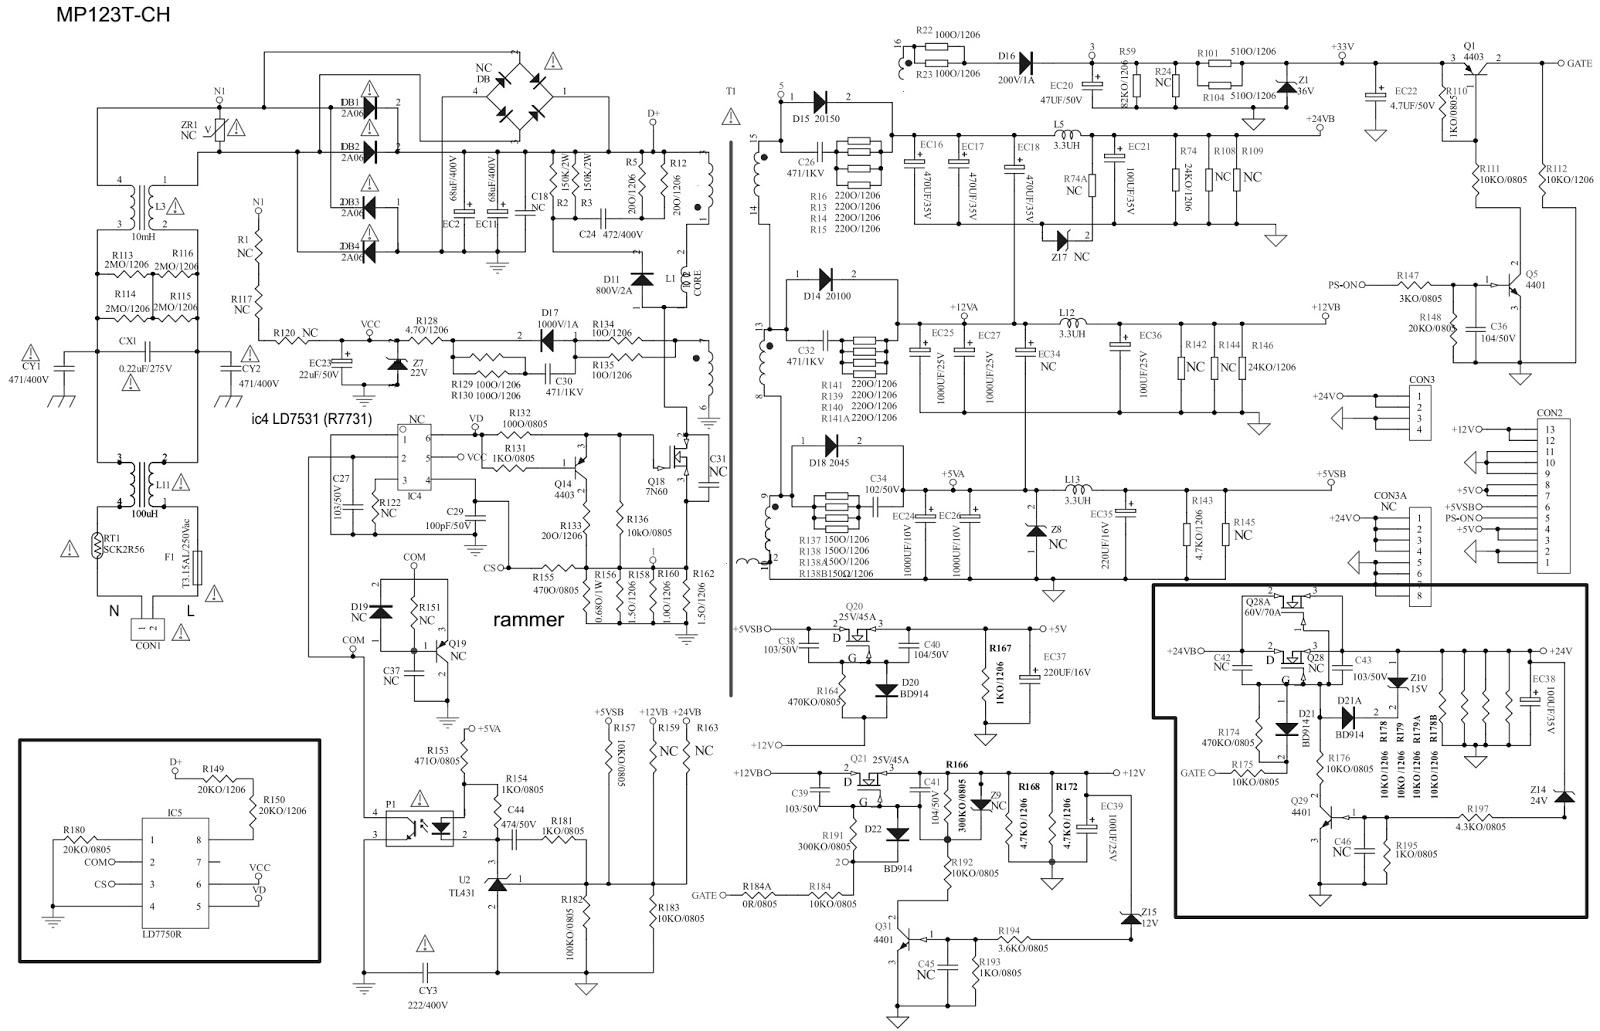 Vizio tv schematics wiring diagram mp123t ch smps schematics smps schematic philco 32 inch led lcd tv samsung tv wiring diagram asfbconference2016 Gallery